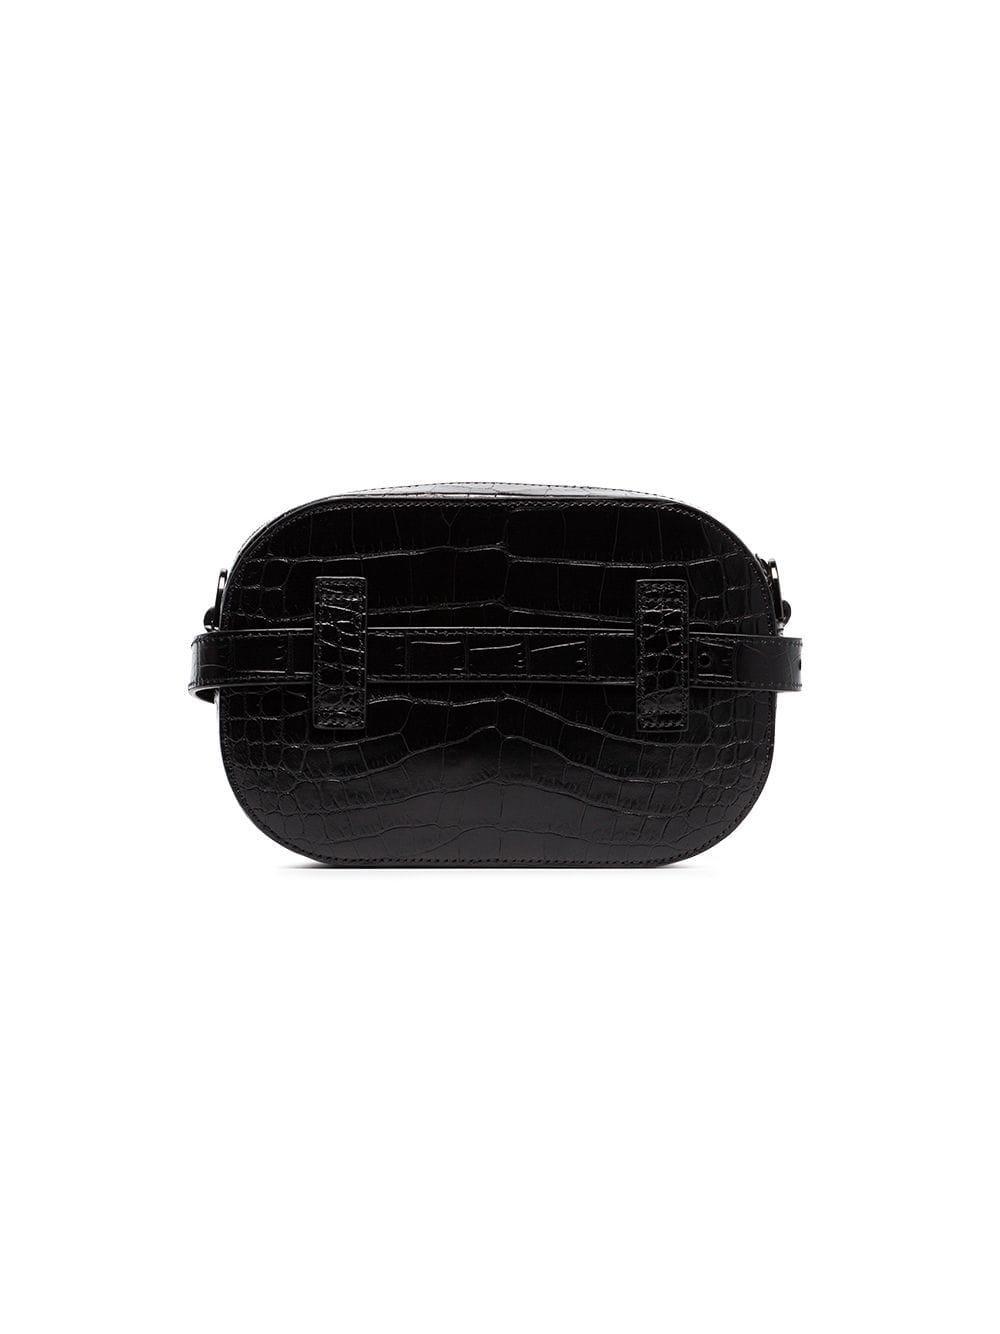 09a3799778f4 Off-White c o Virgil Abloh - Black Crocodile Embossed Leather Camera Bag -.  View fullscreen